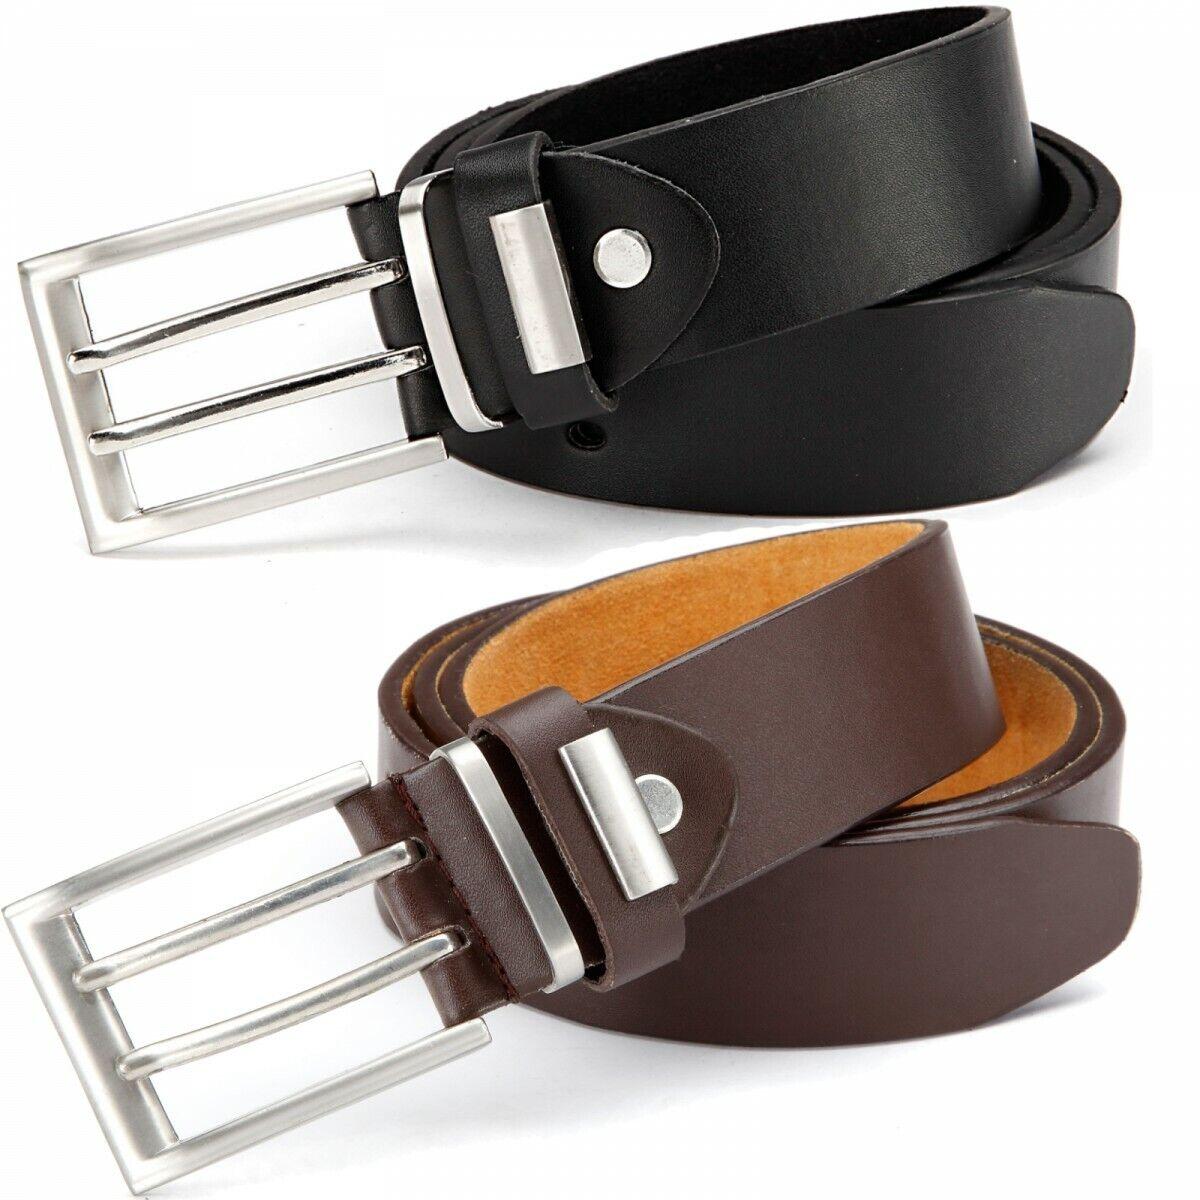 Jeans Belt Wide Removable Buckle Belt Men's Belt 084 SALE JOBLOT